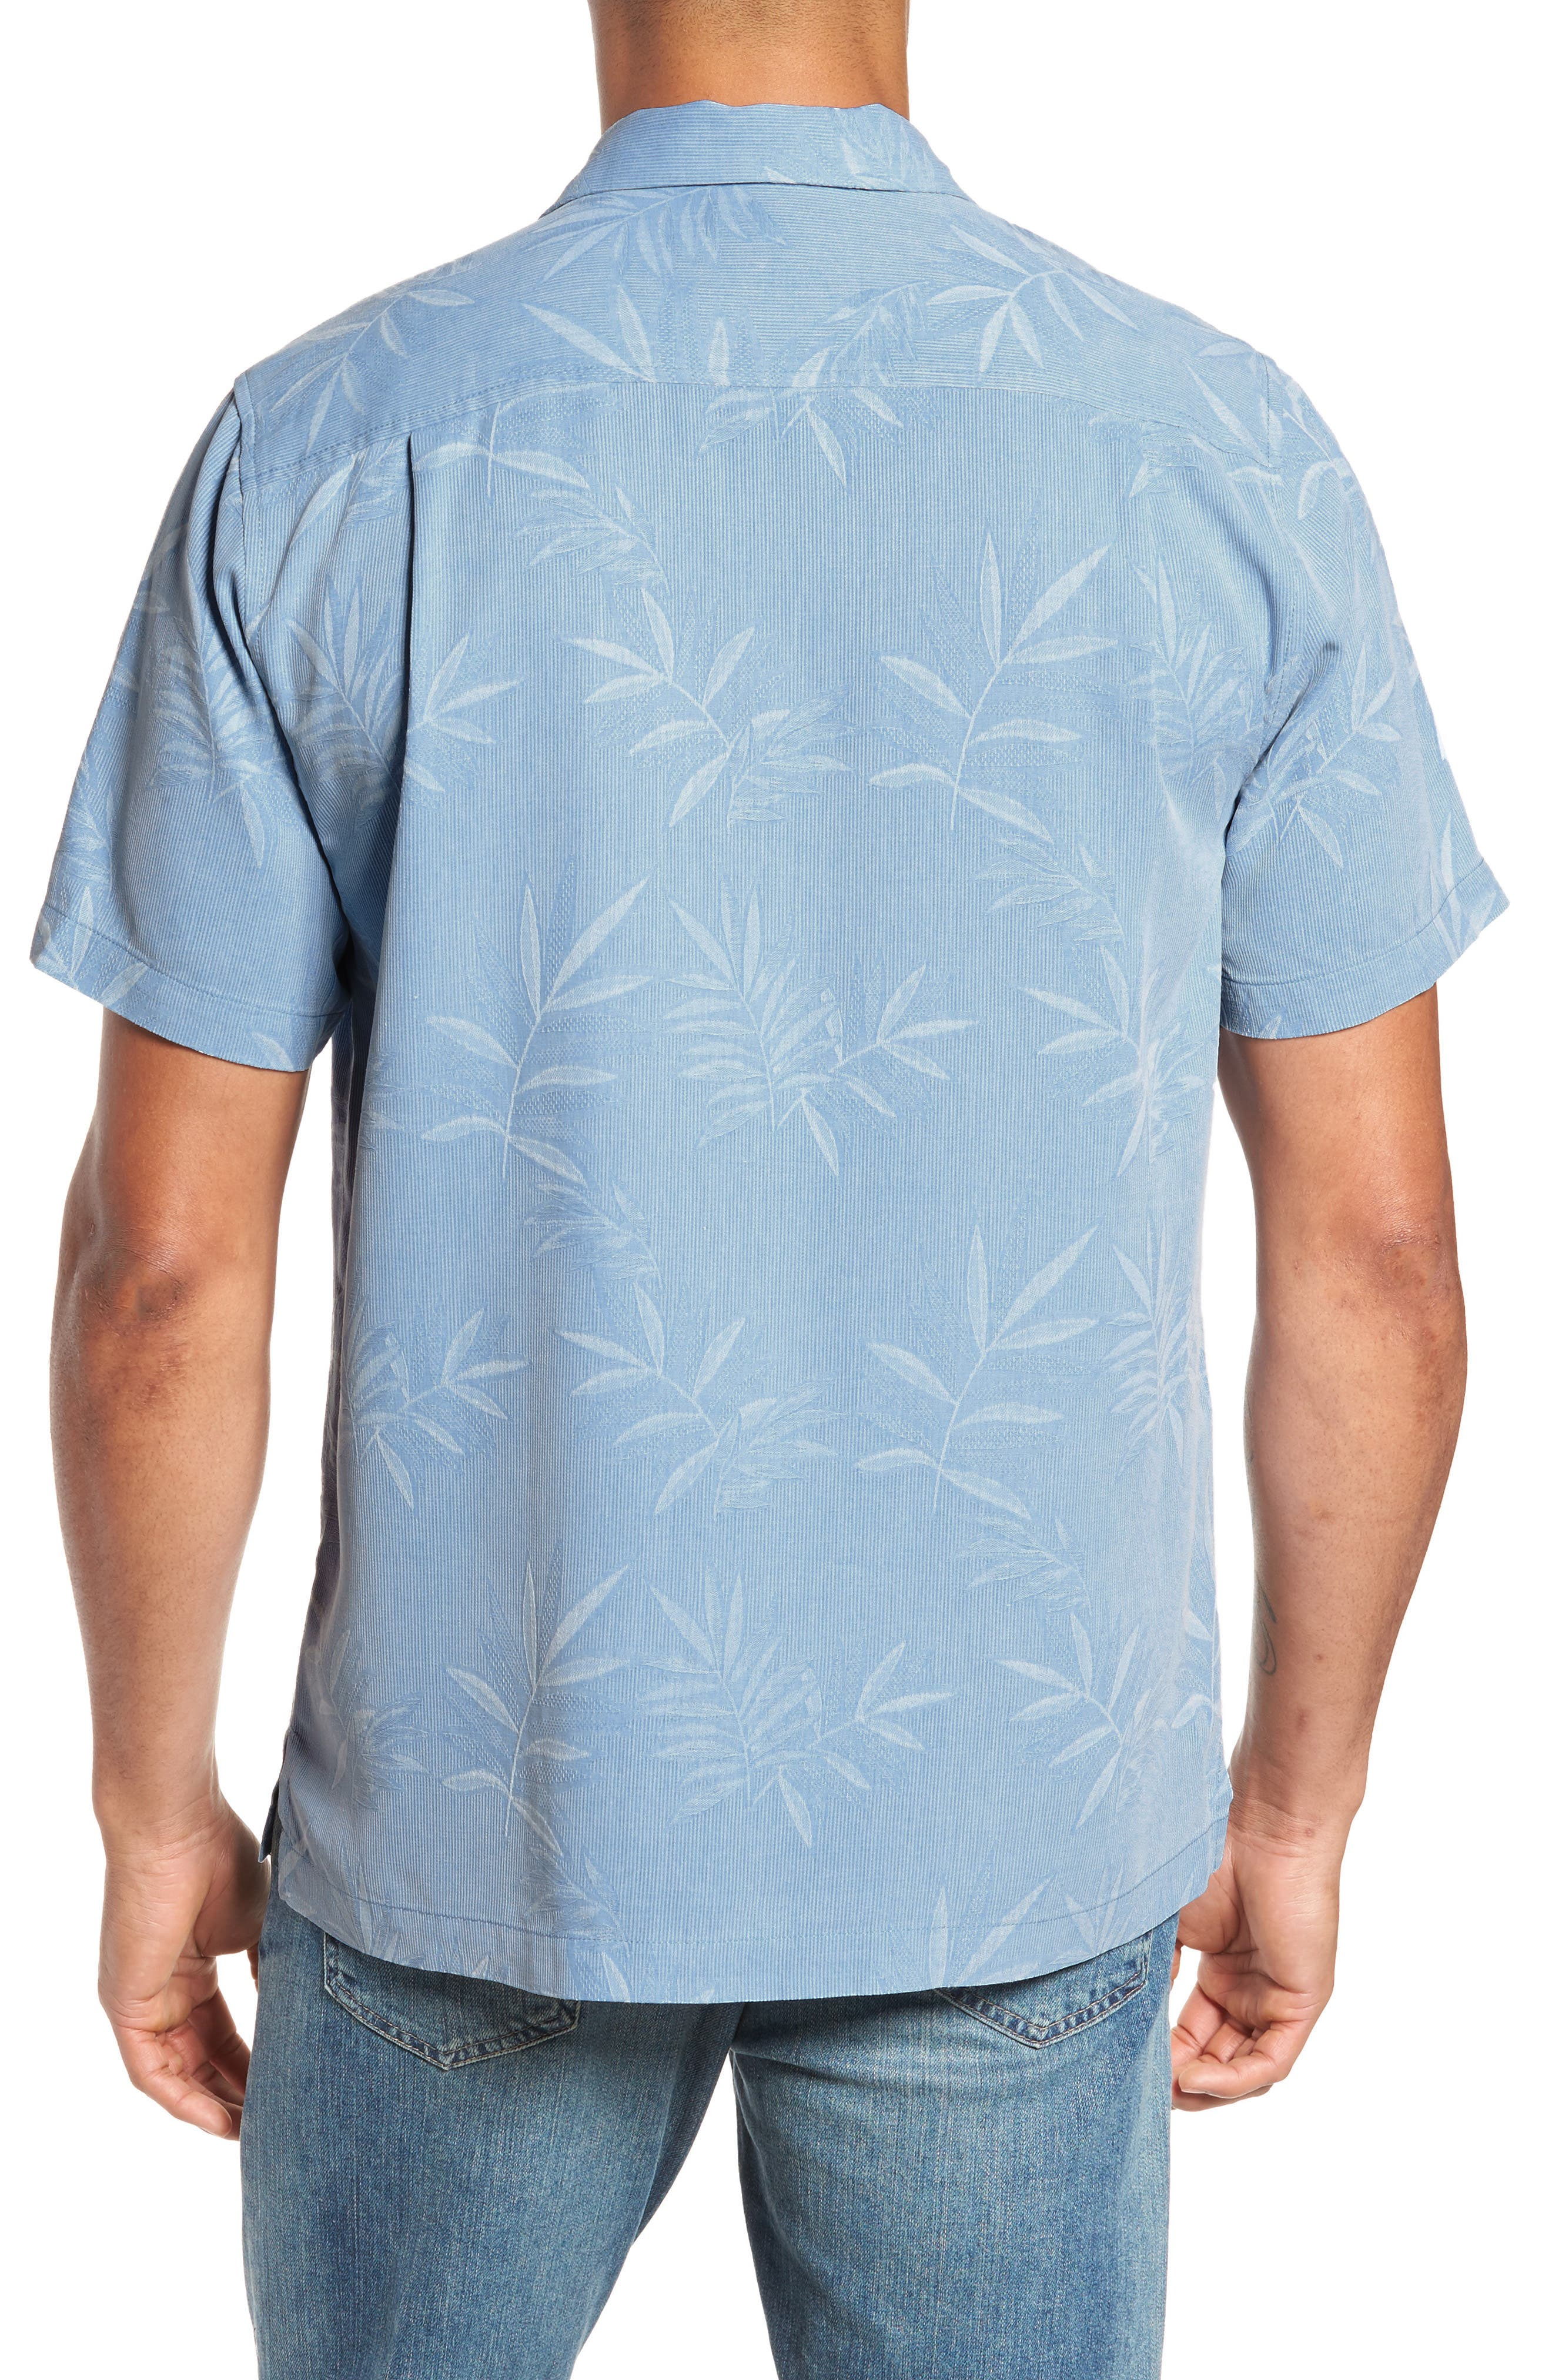 Luau Floral Silk Shirt,                             Alternate thumbnail 2, color,                             LIGHT SKY